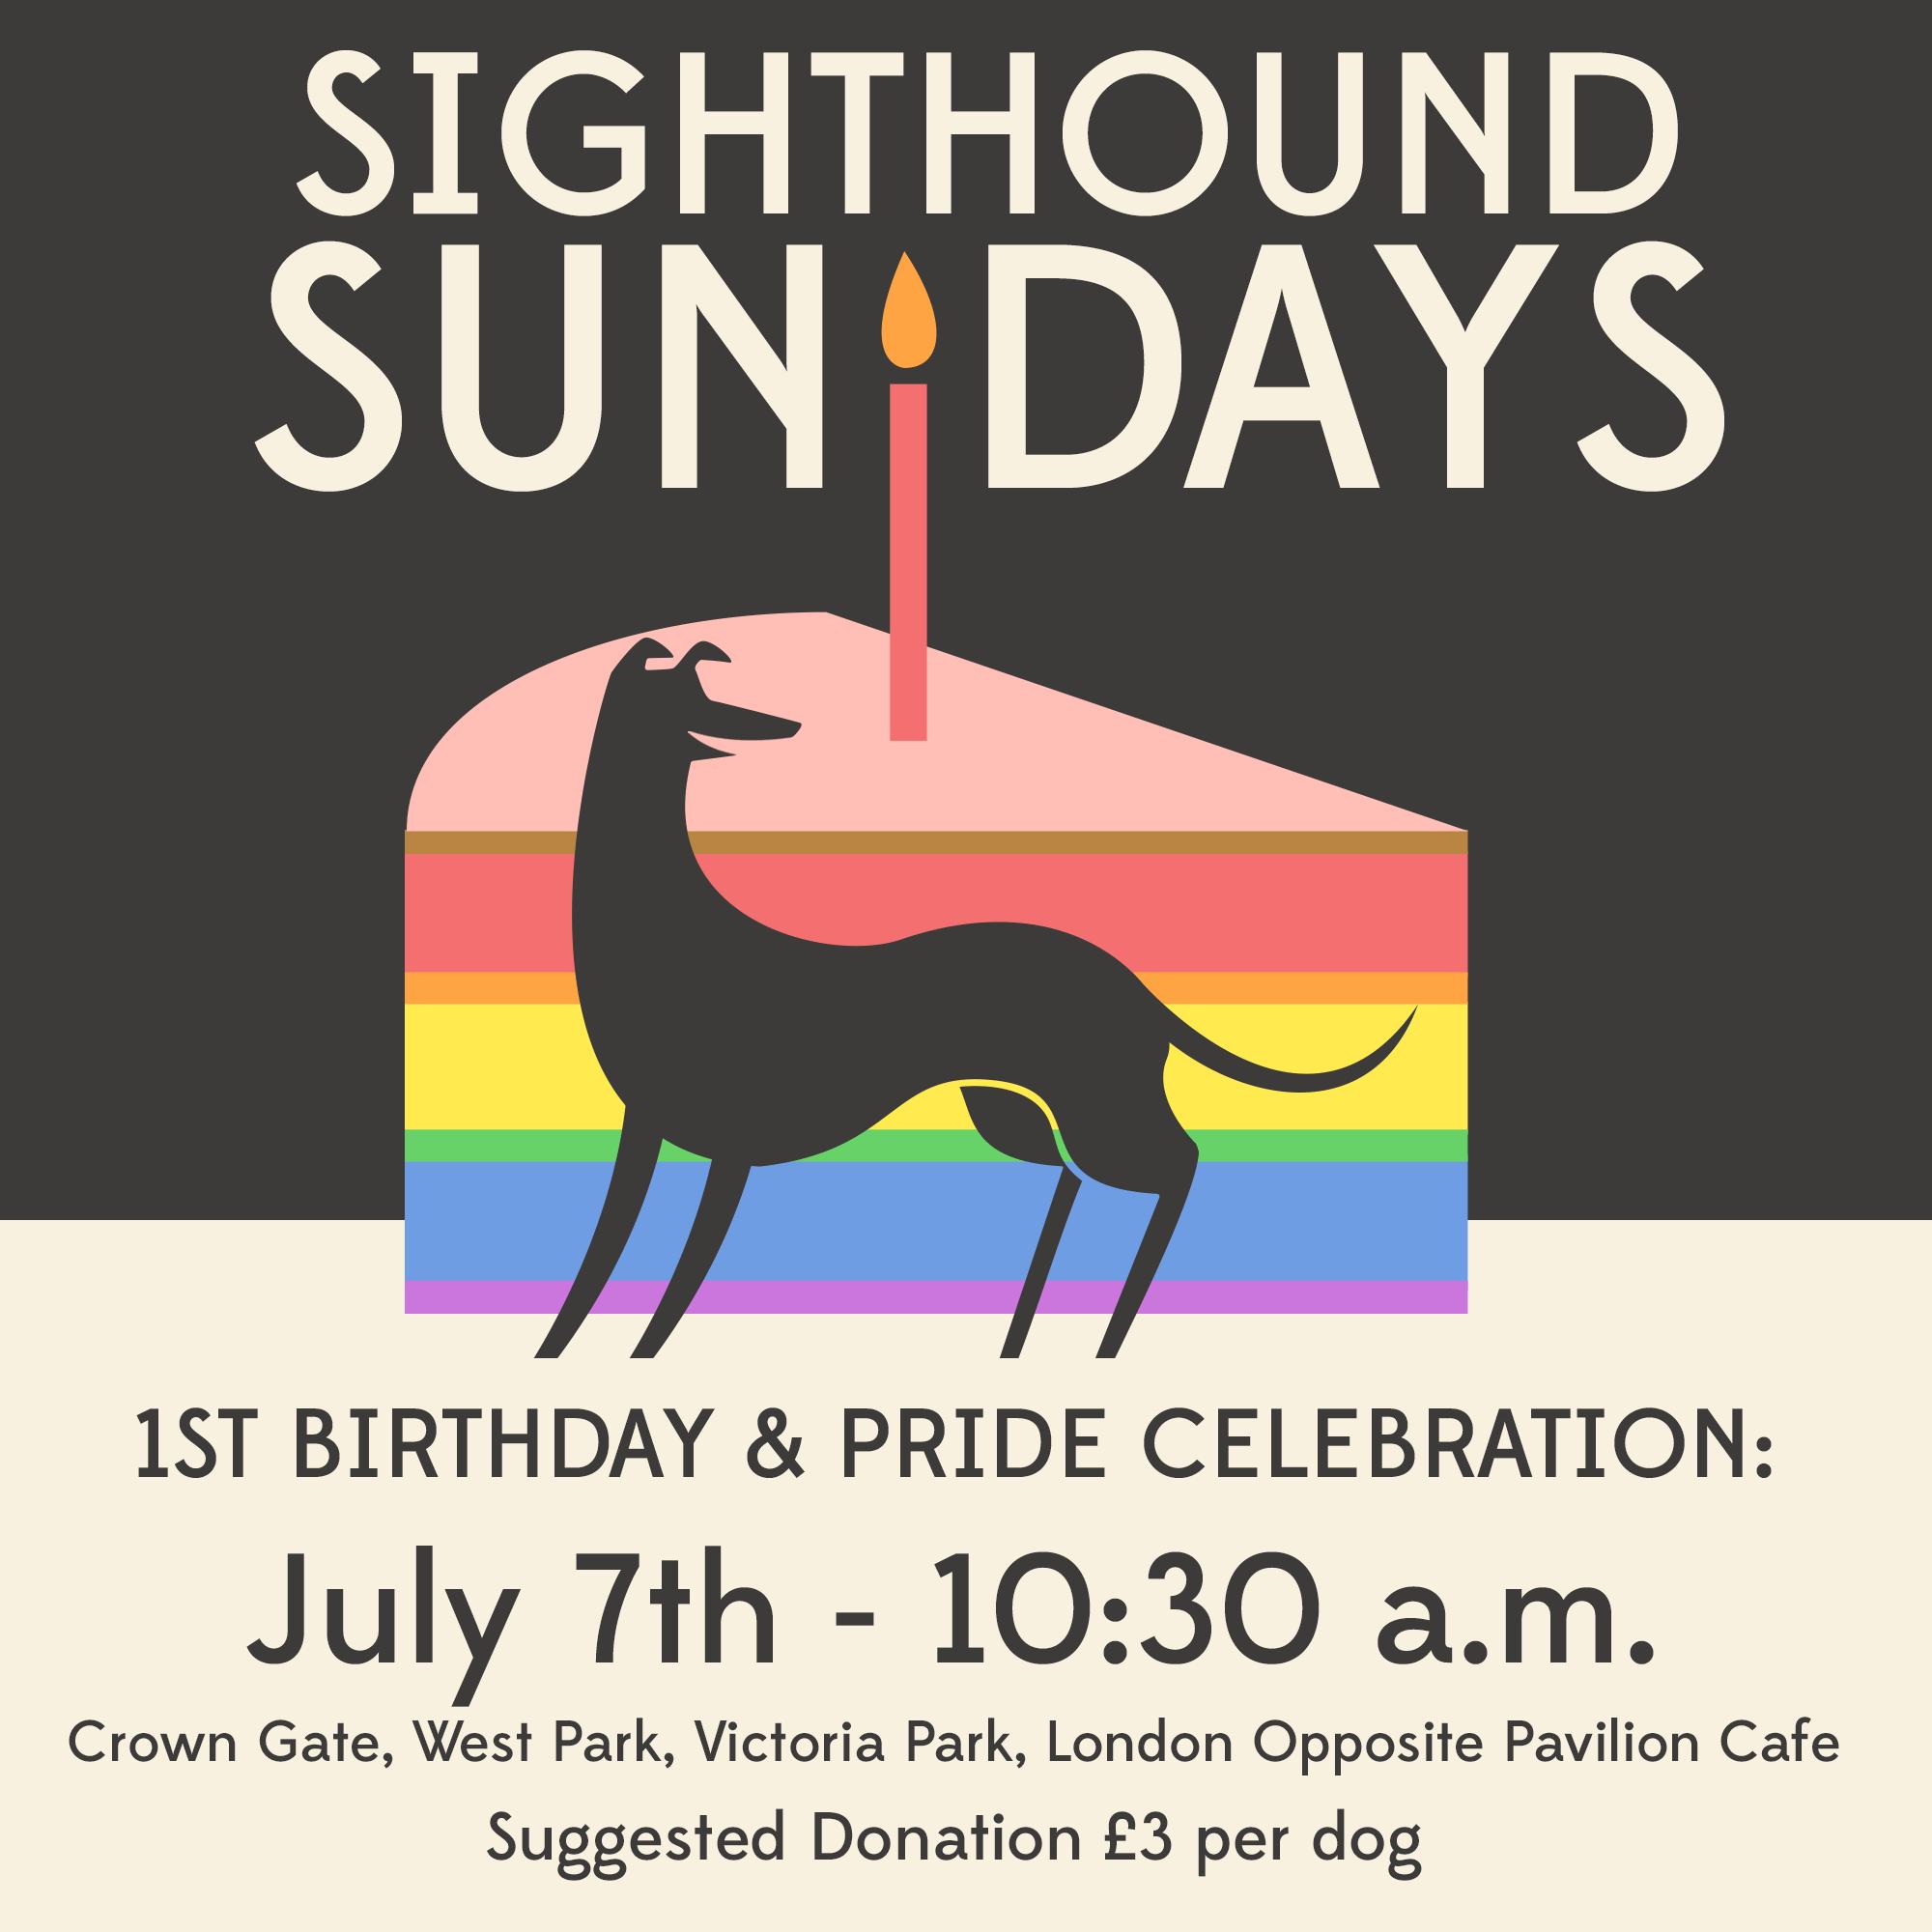 SighthoundSundays_Instagram_PrideSpecial.png